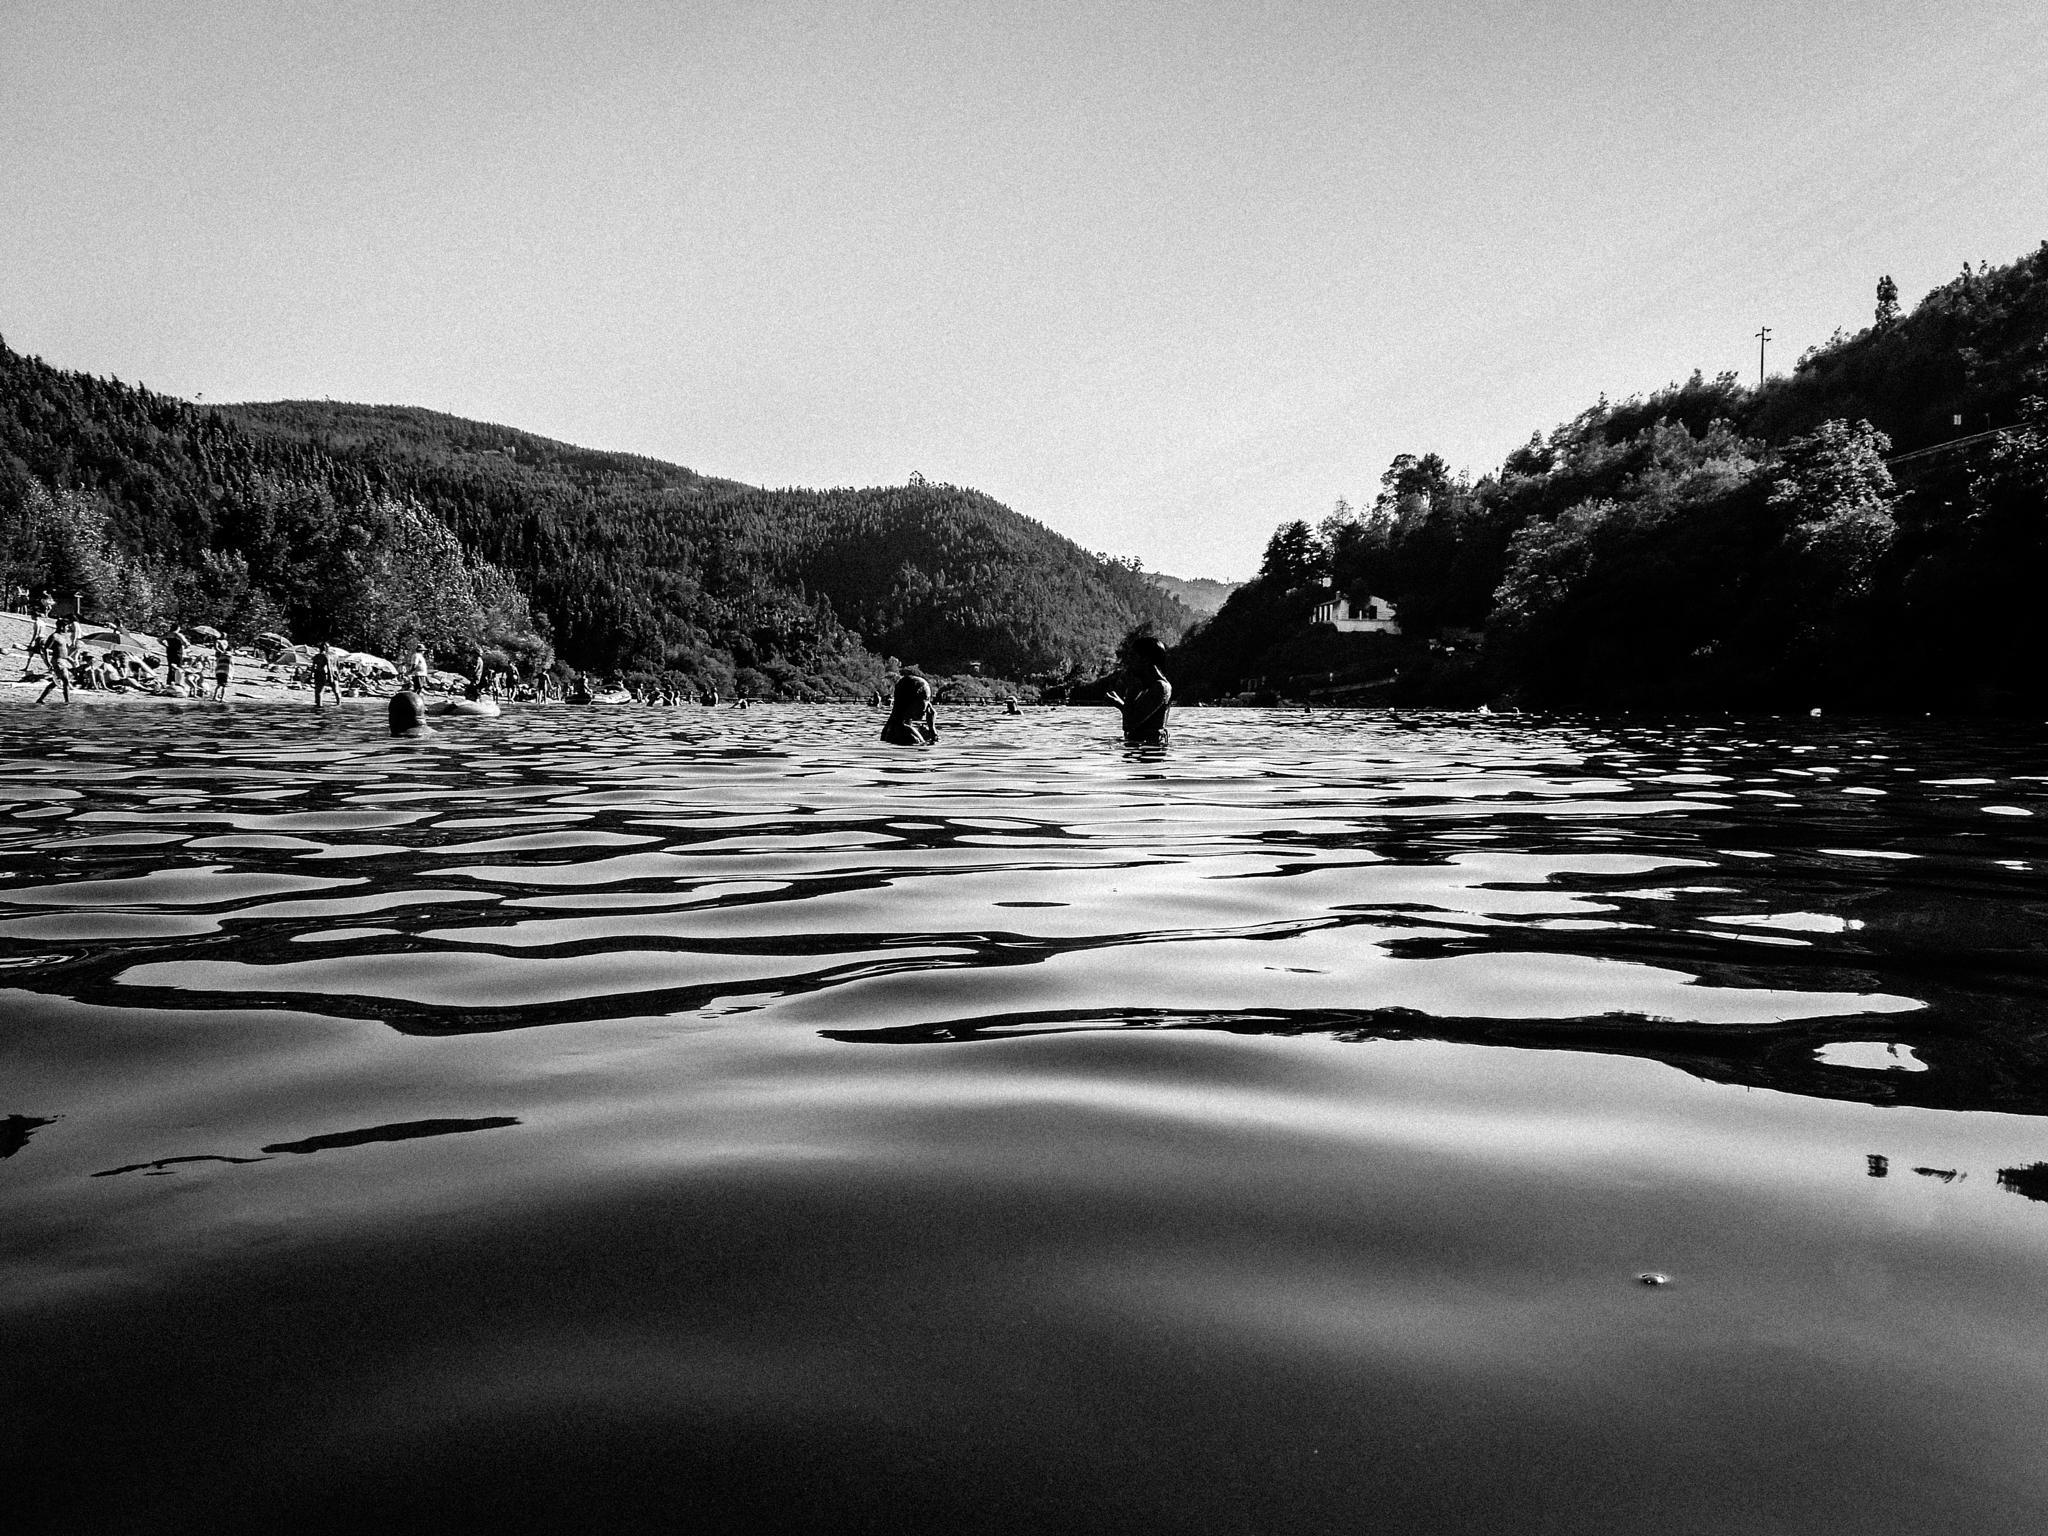 plunge by Ana Botelho